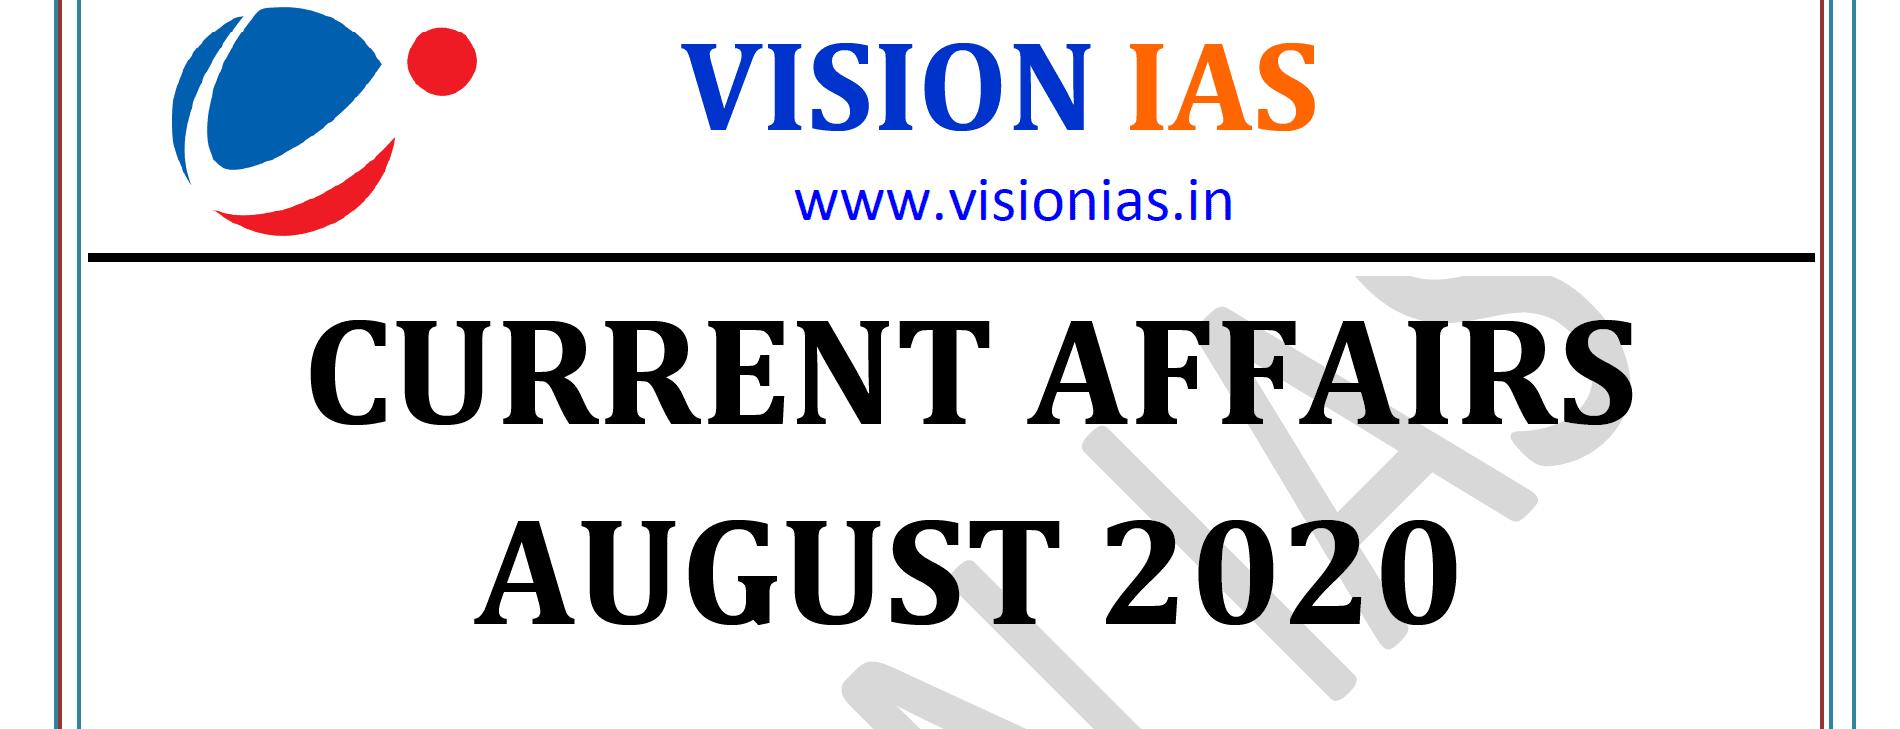 Vision IAS Current Affairs August 2020 pdf